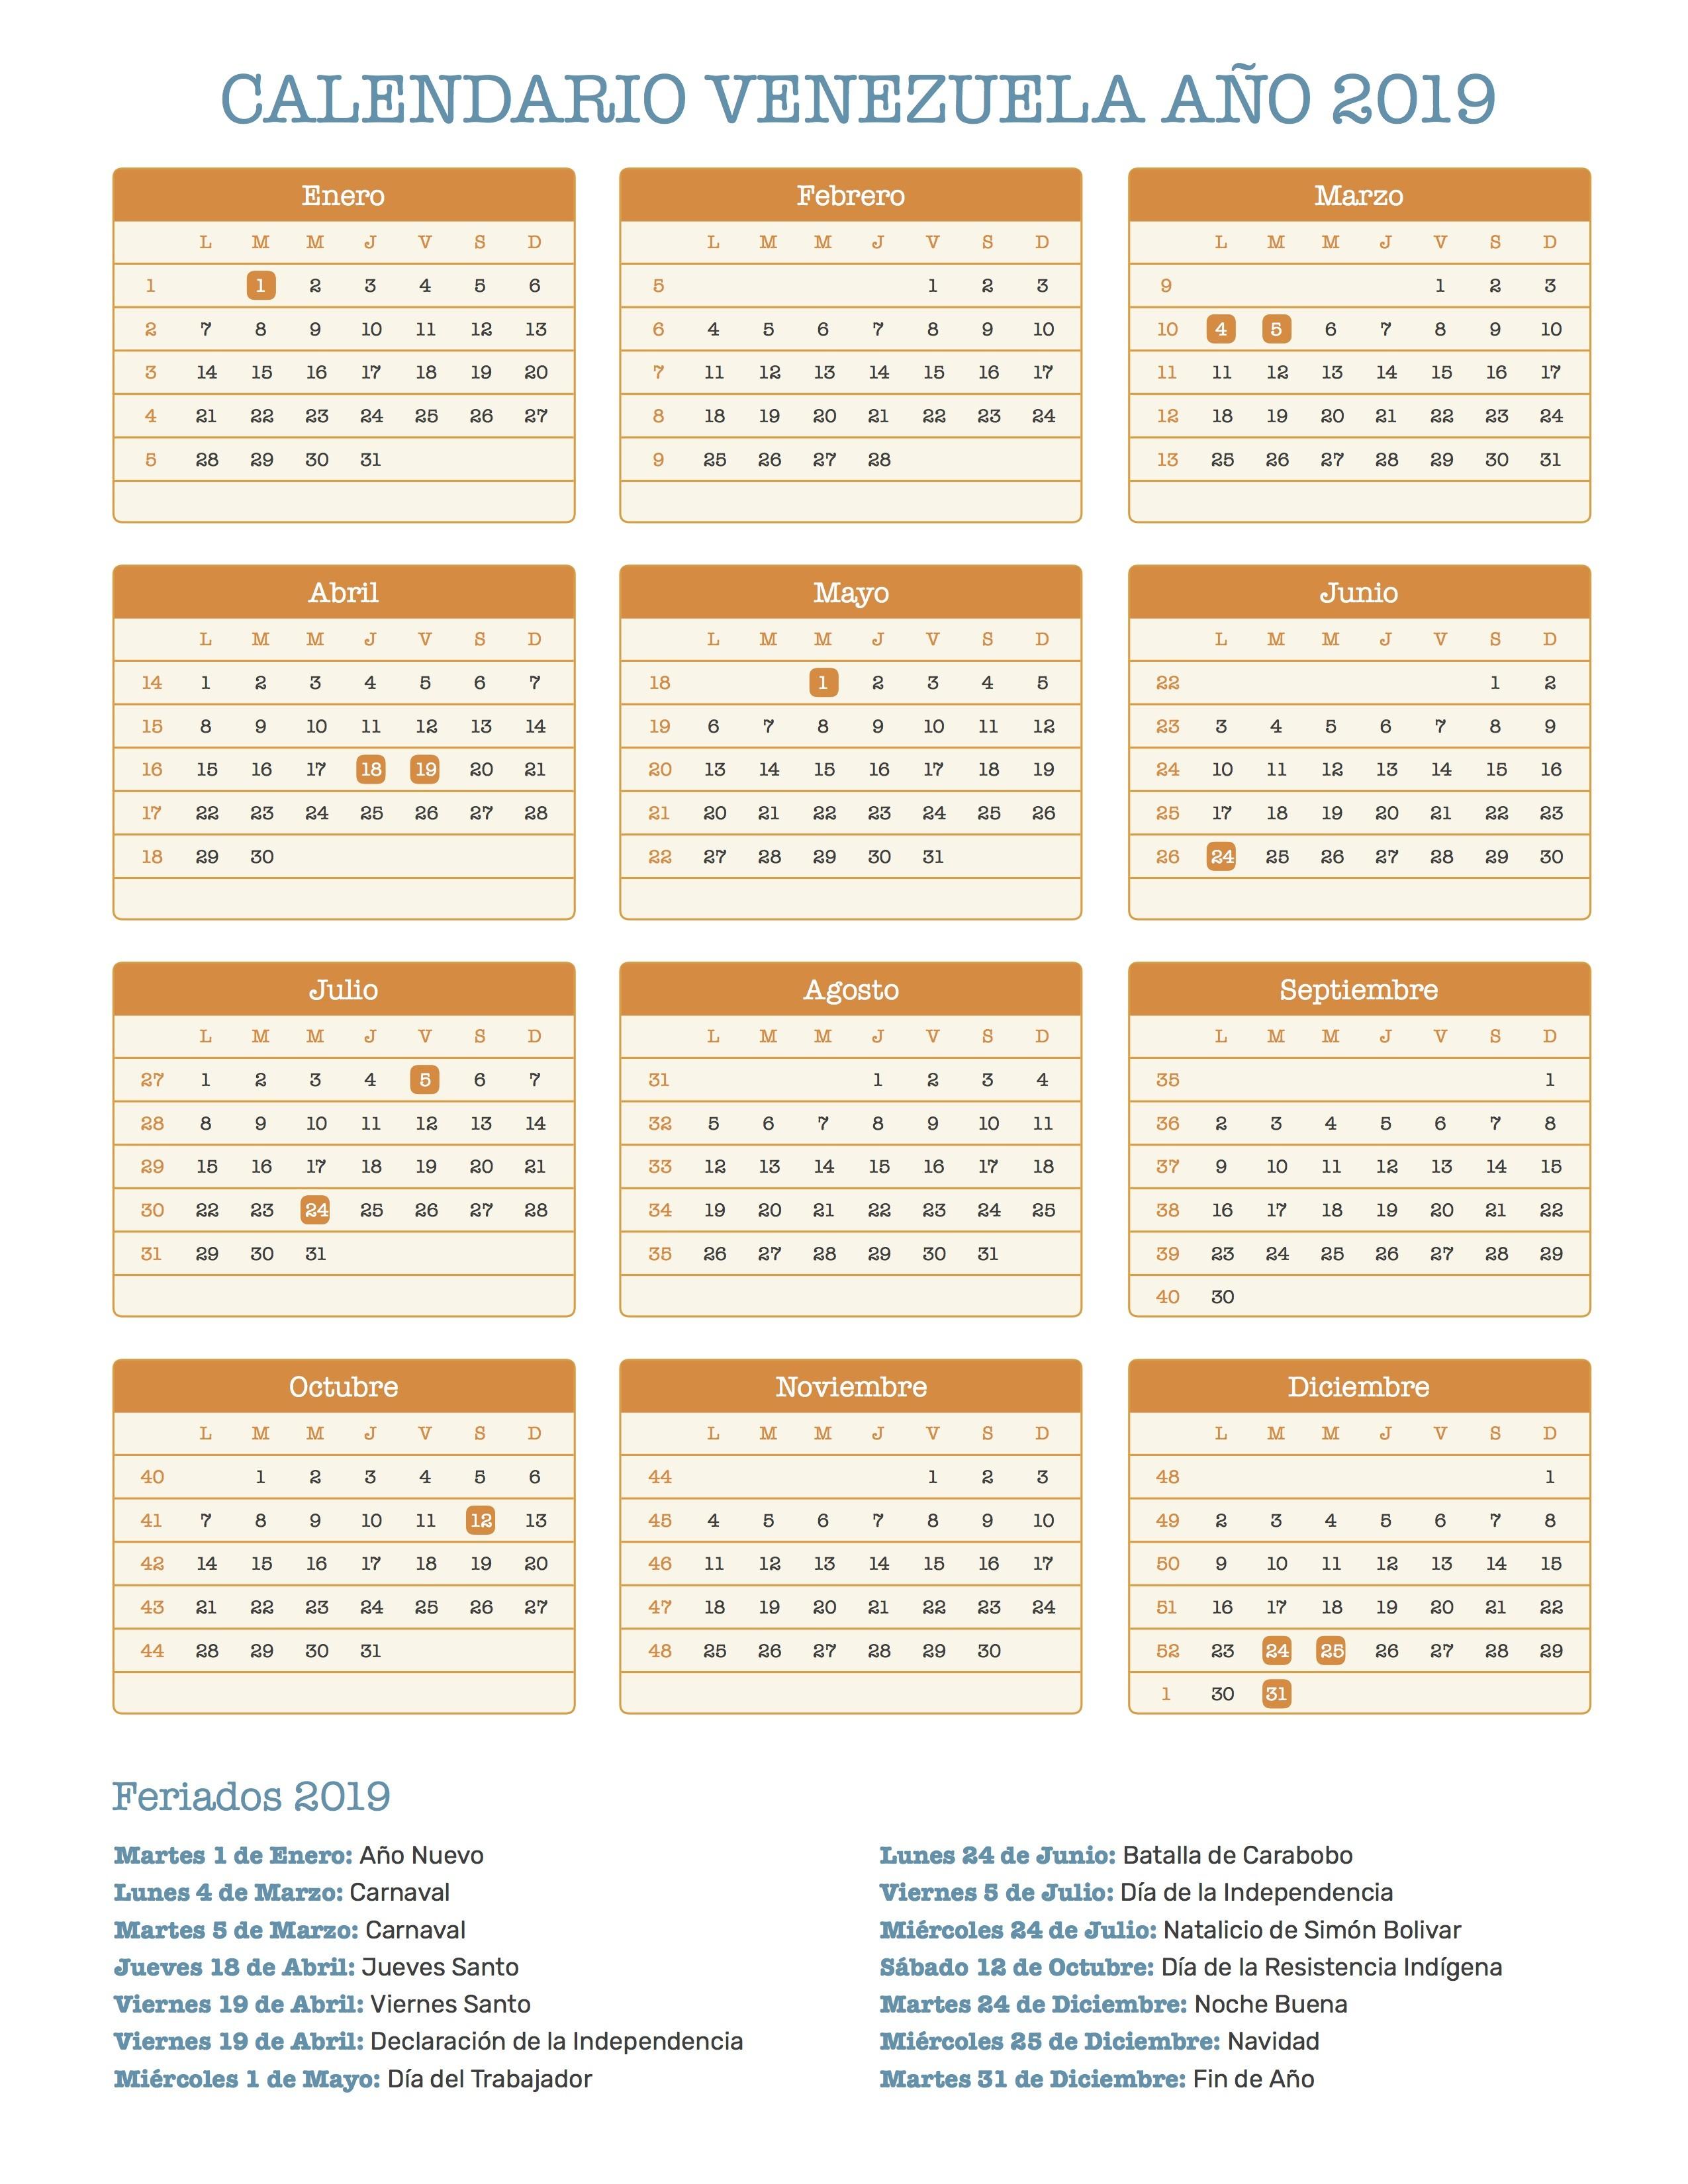 Calendario para Imprimir de Venezuela con feriados 2019